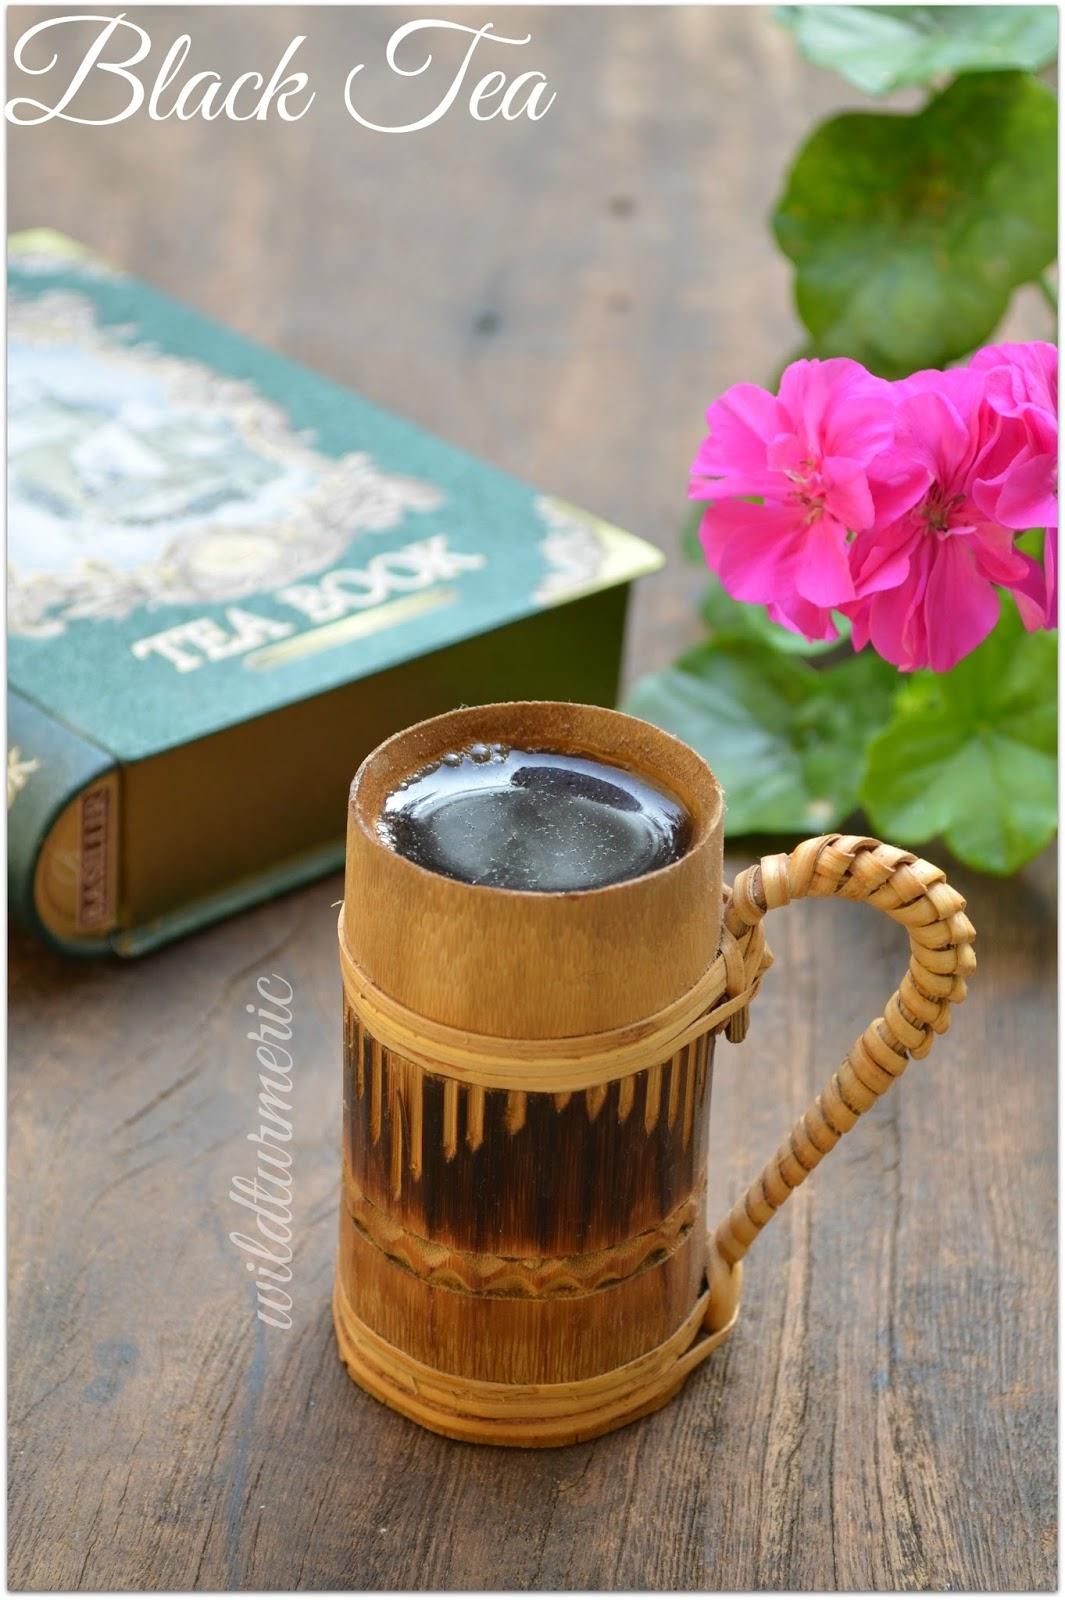 10 Top Benefits Of Black Tea For Skin, Hair & Health